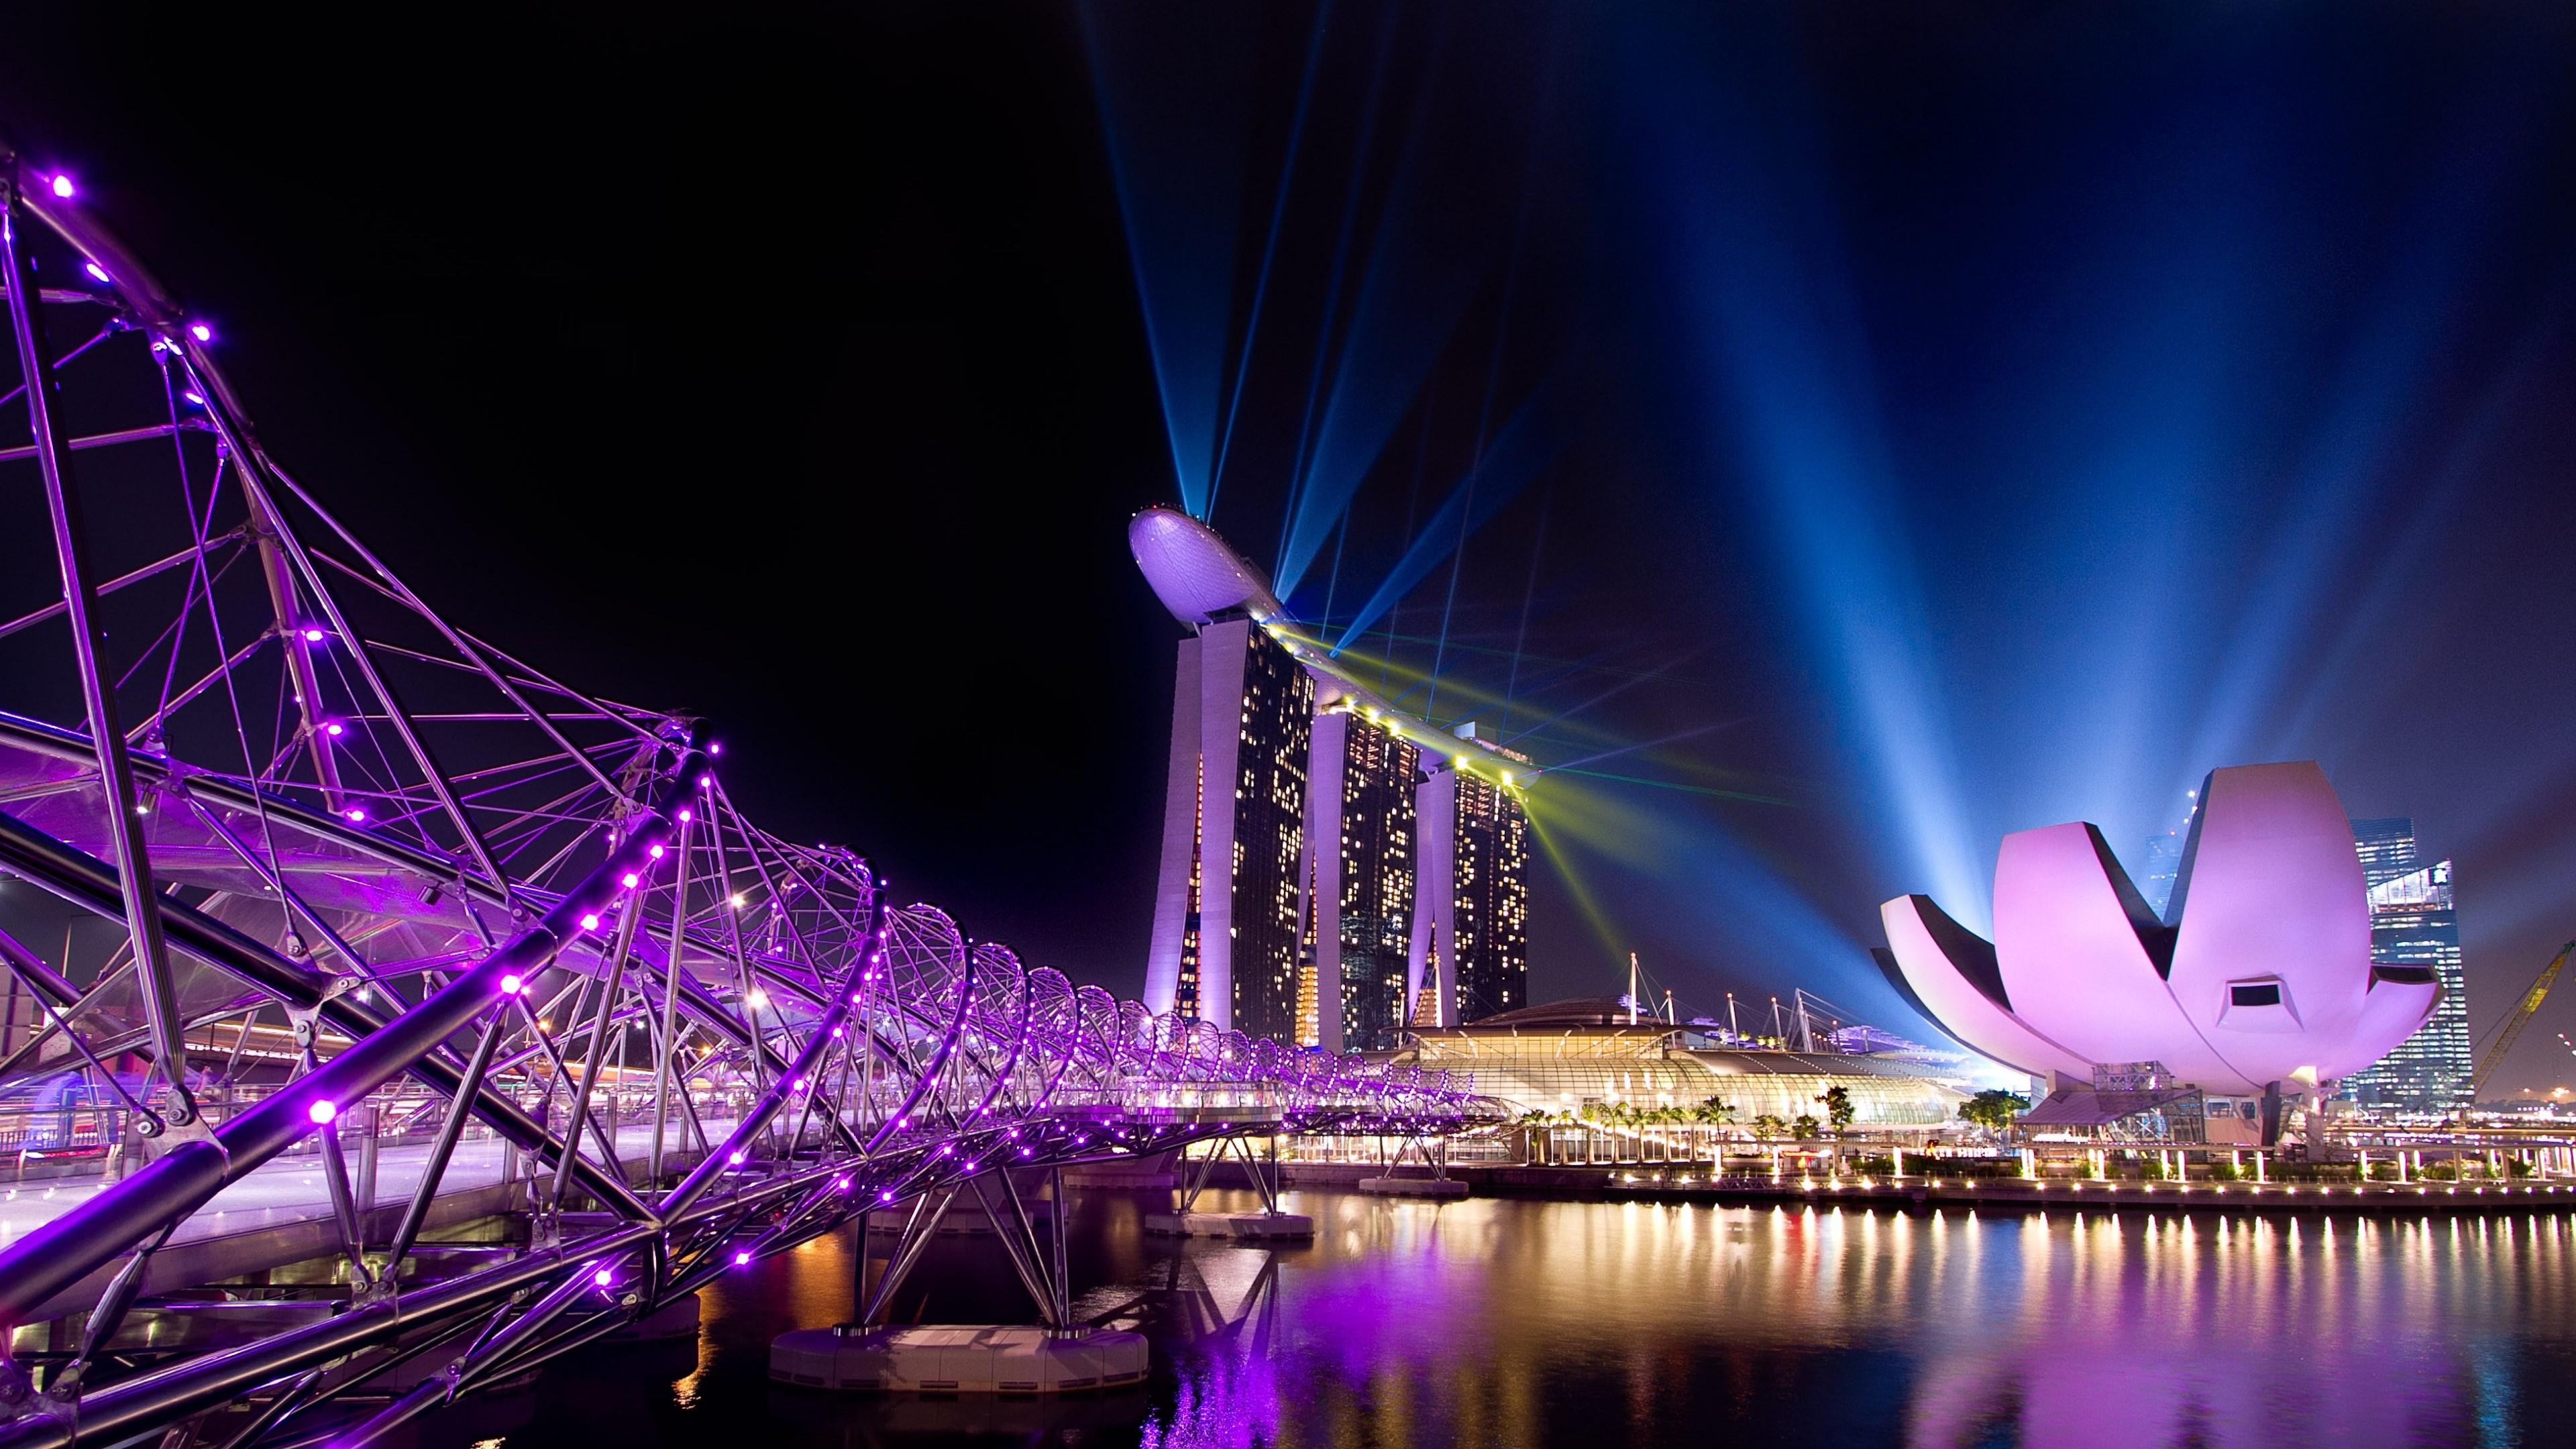 Helix Bridge and Marina Bay, Singapore wallpaper